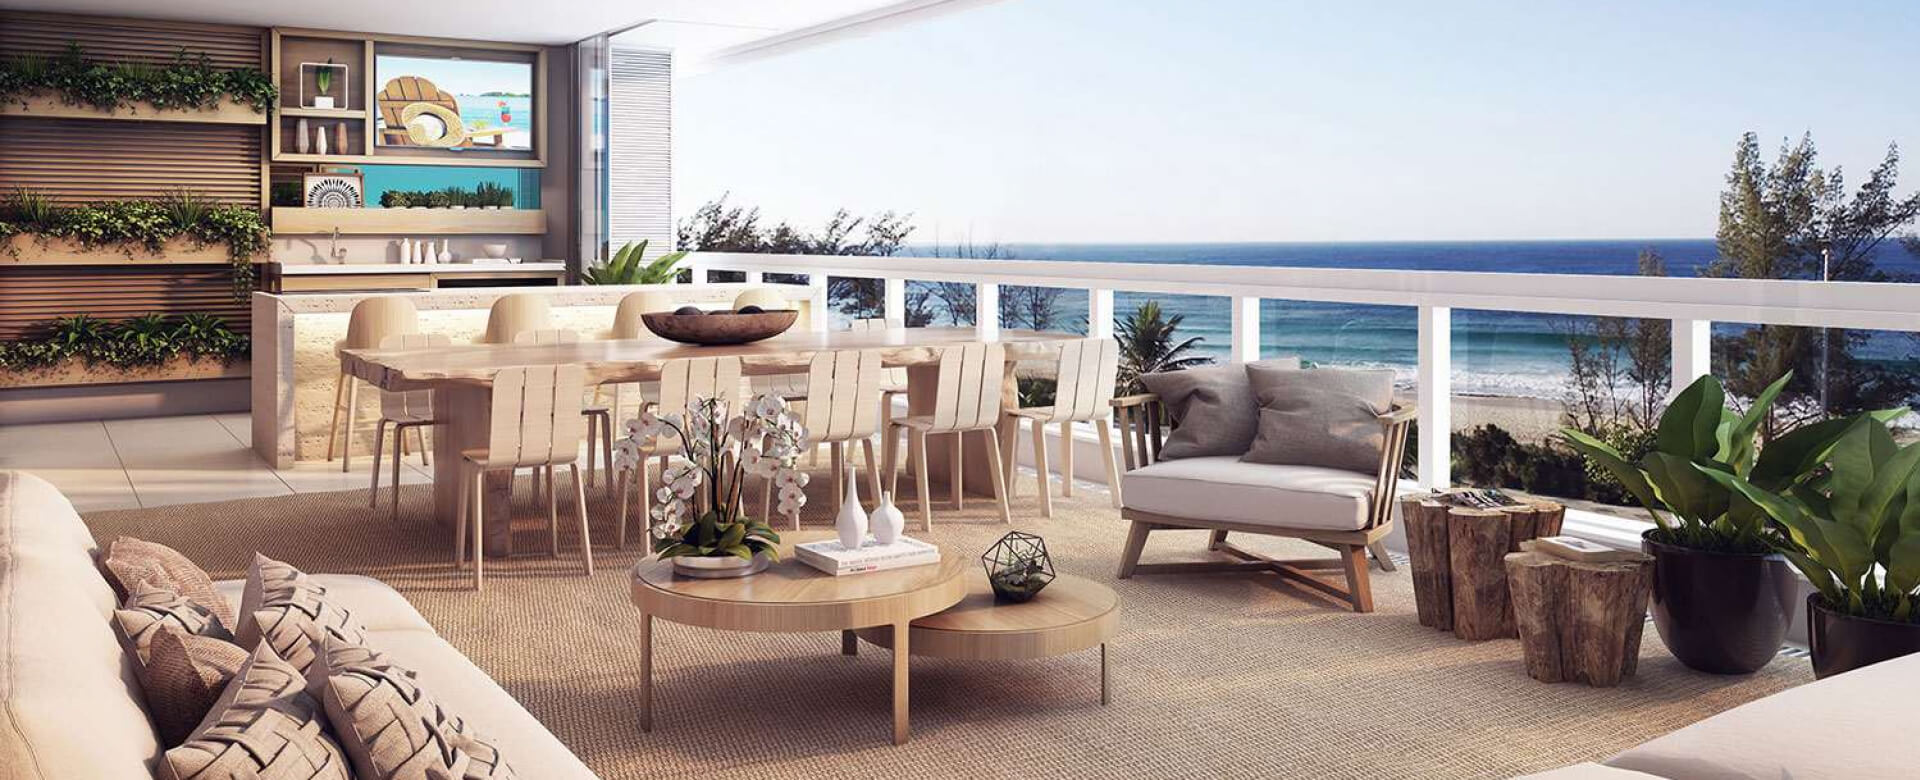 Oceana Waterfront Residence, foto 1